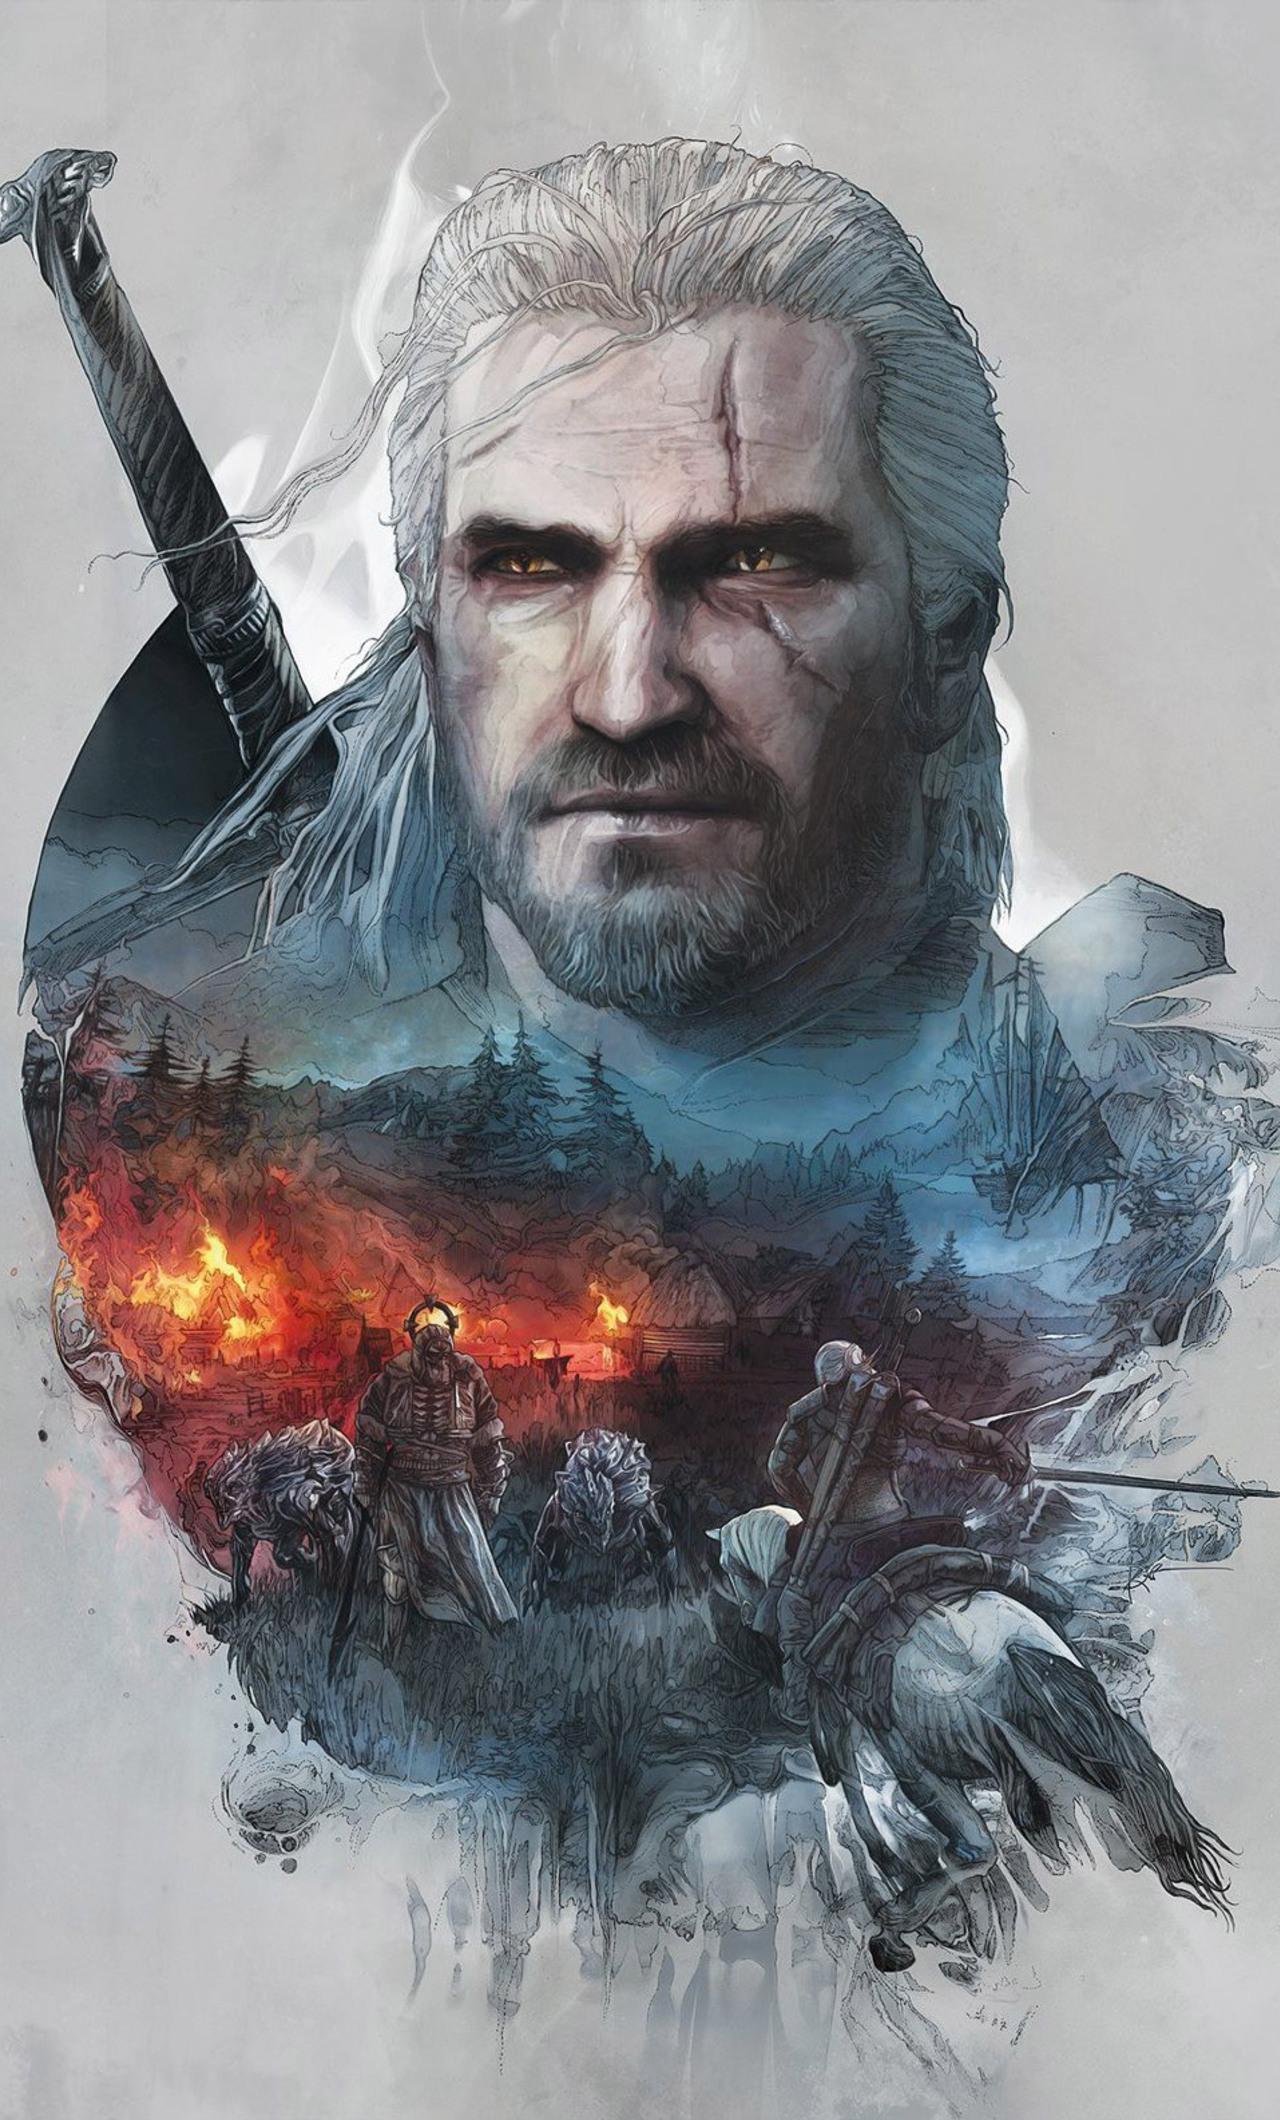 1280x2120 The Witcher 3 Geralt Of Rivia Artwork Iphone 6 Hd 4k